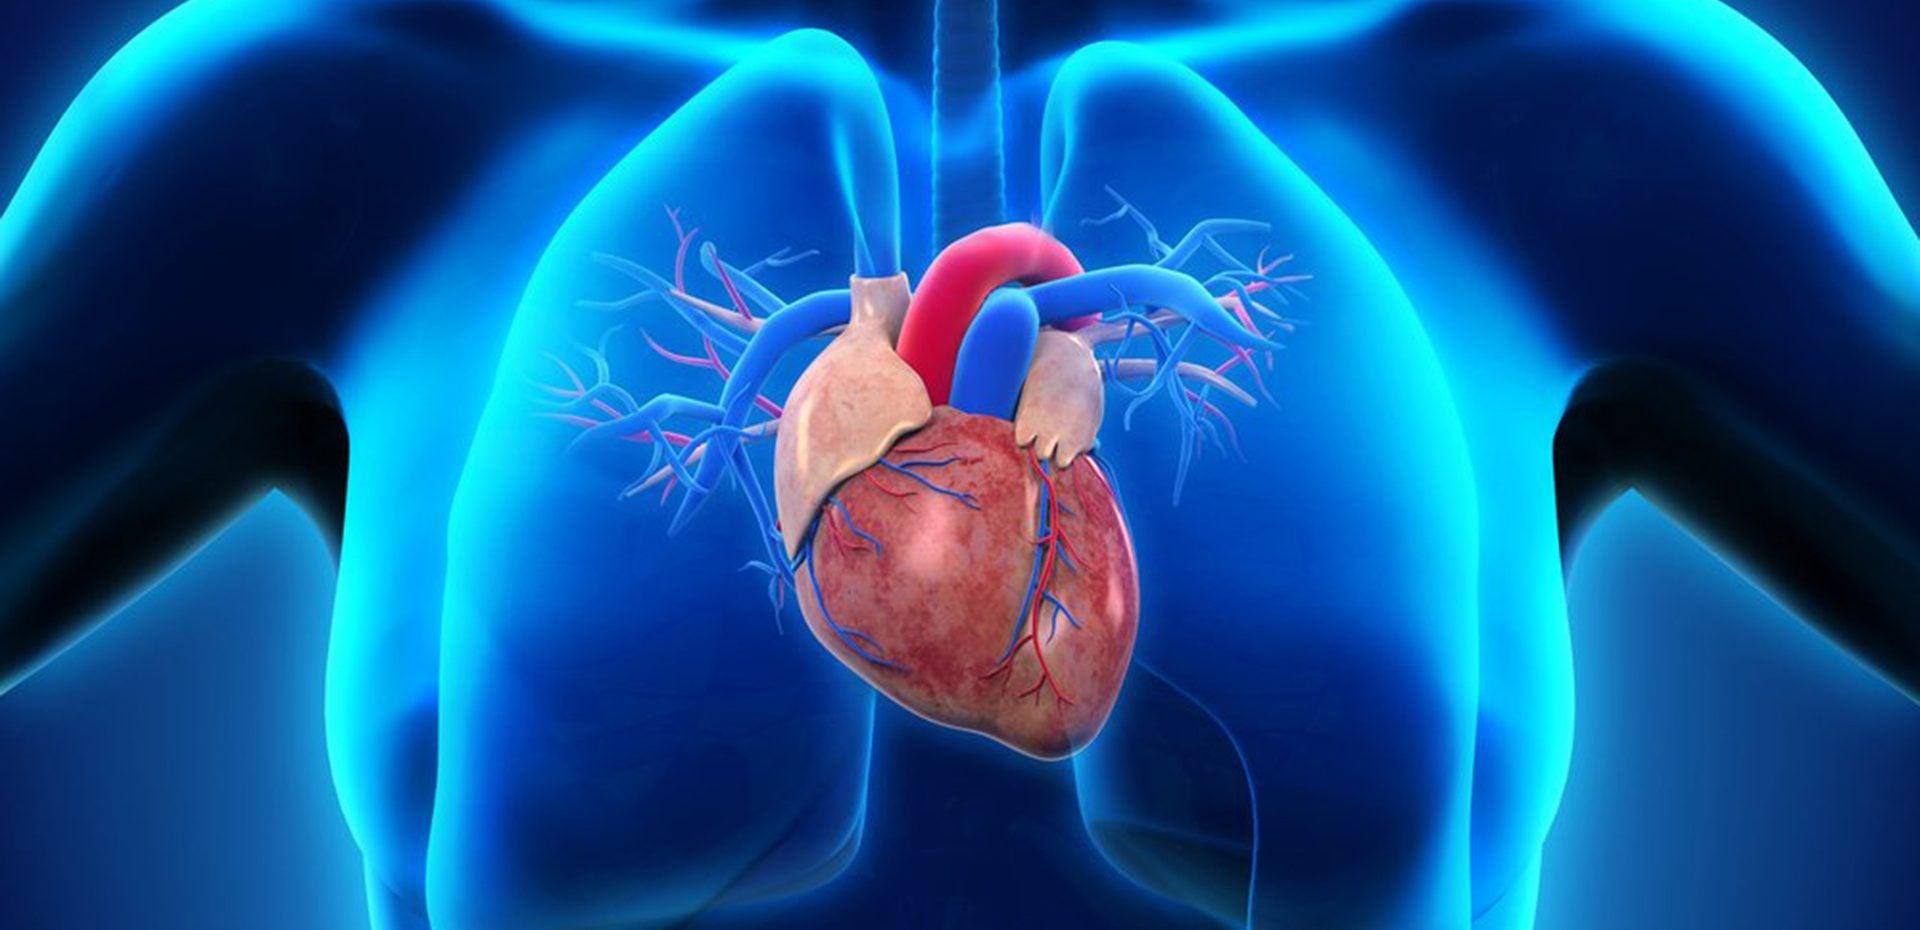 حمله قلبی خاموش و علائم آن